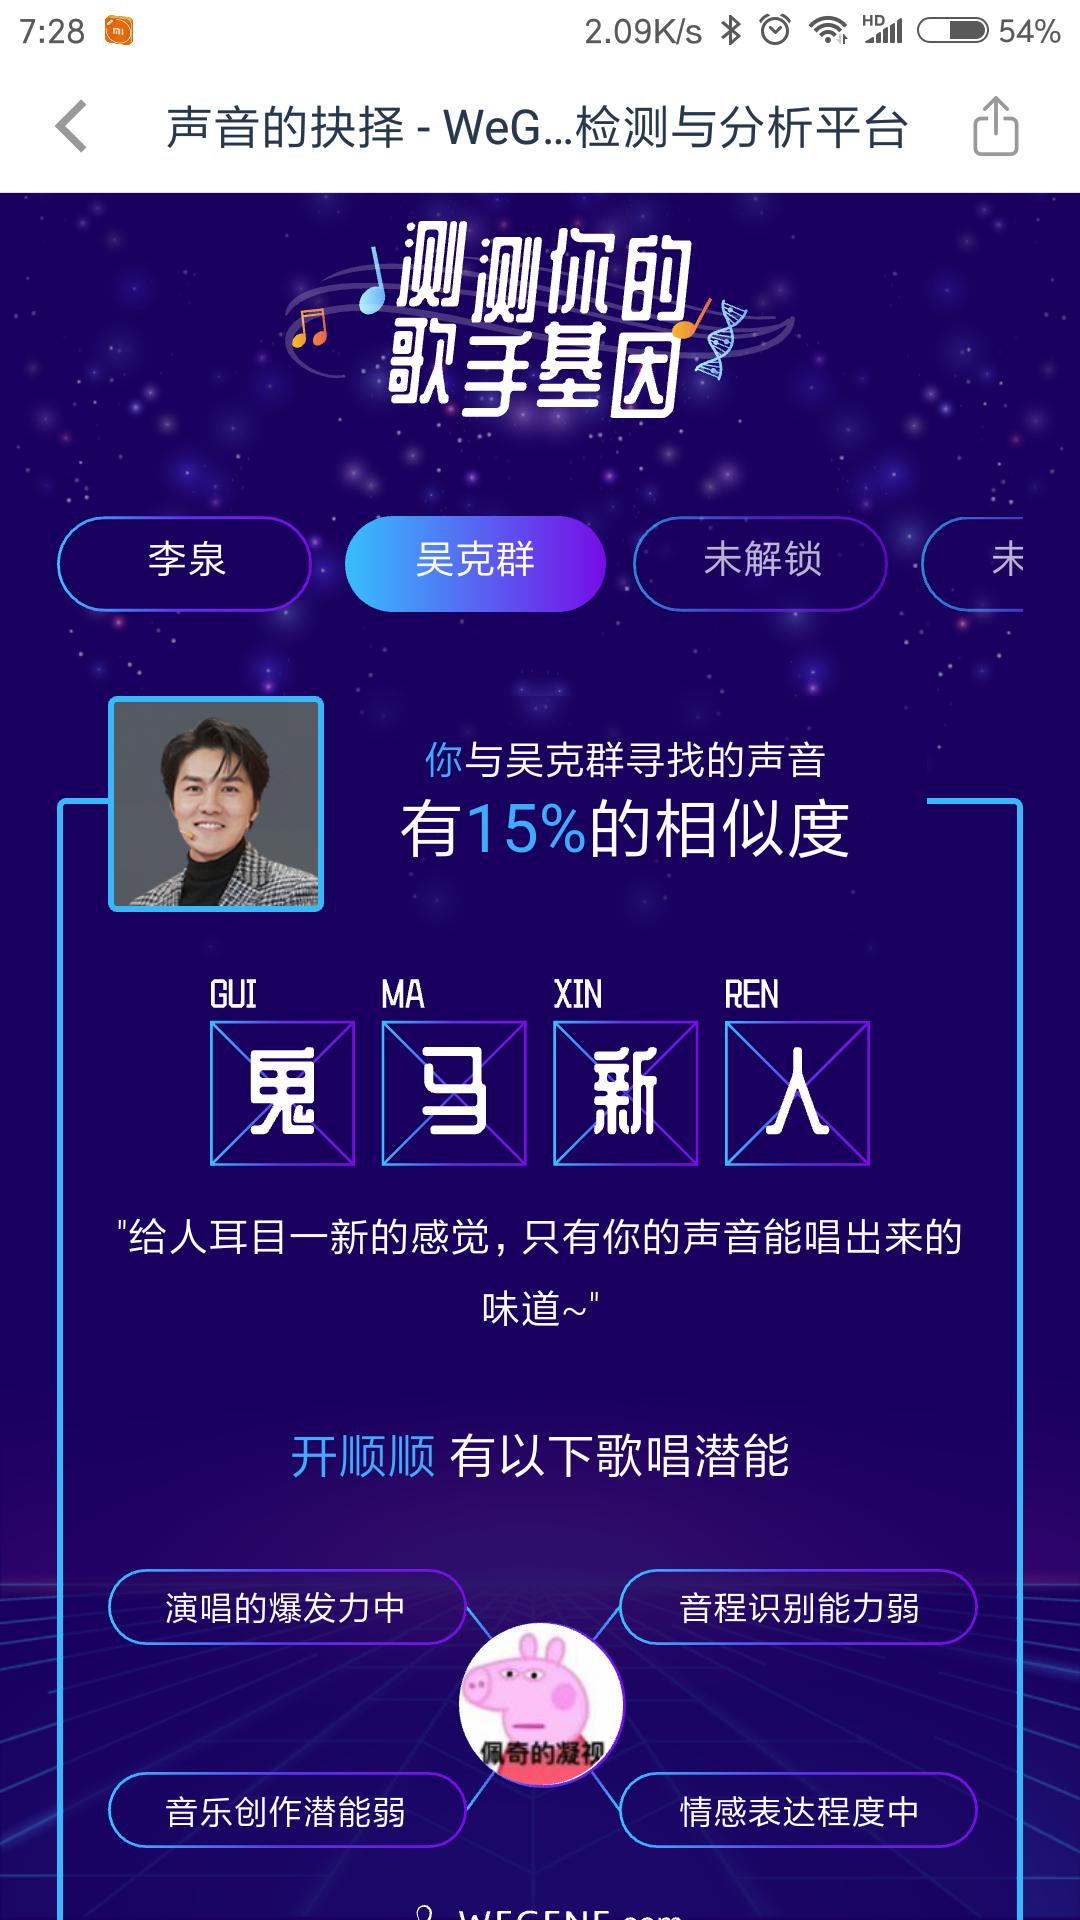 Screenshot_2019-03-03-07-28-53-777_com.wegene_.future_.png